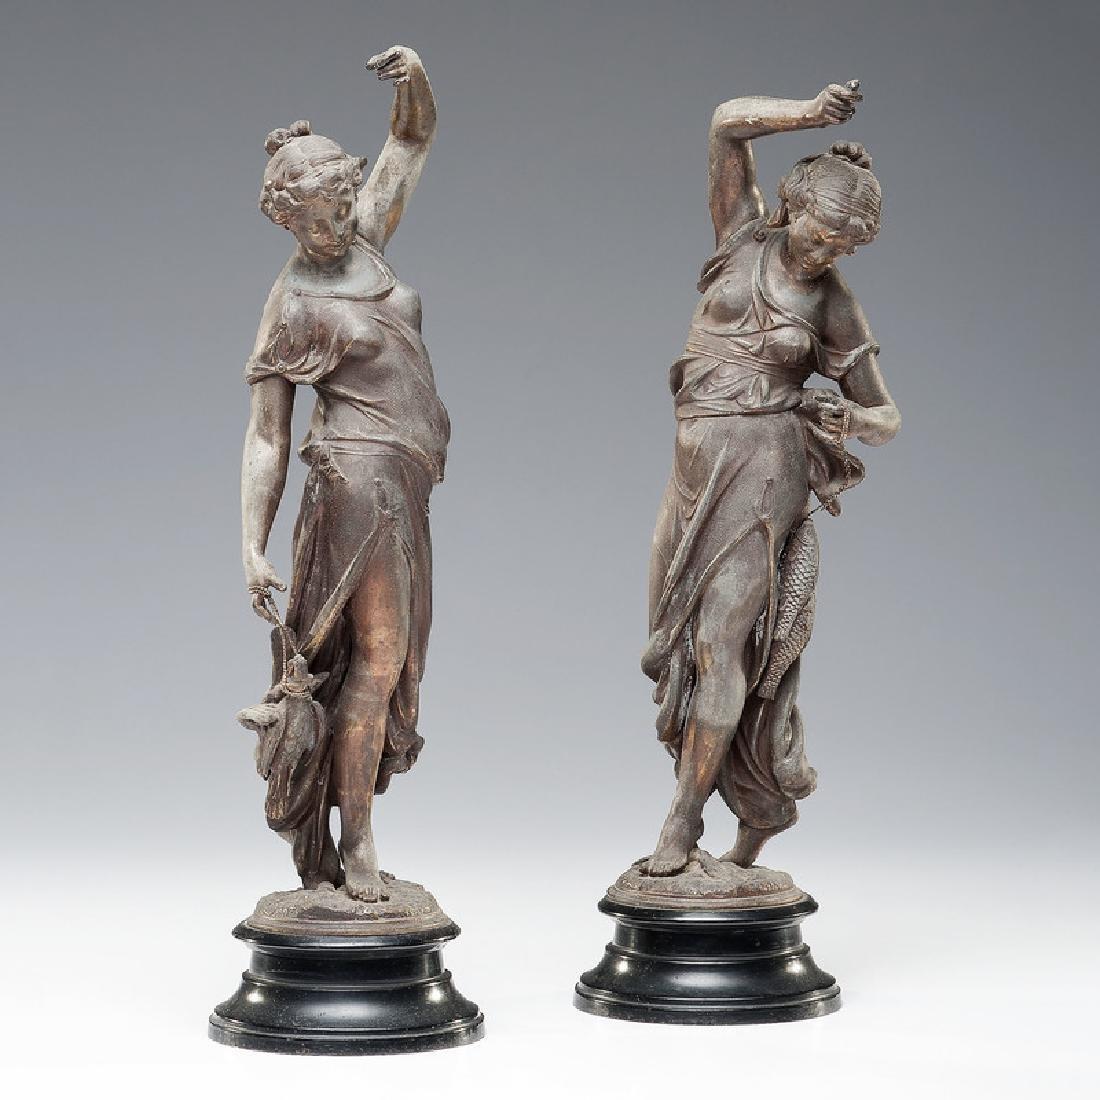 Huntress and Fisher Newel Figures